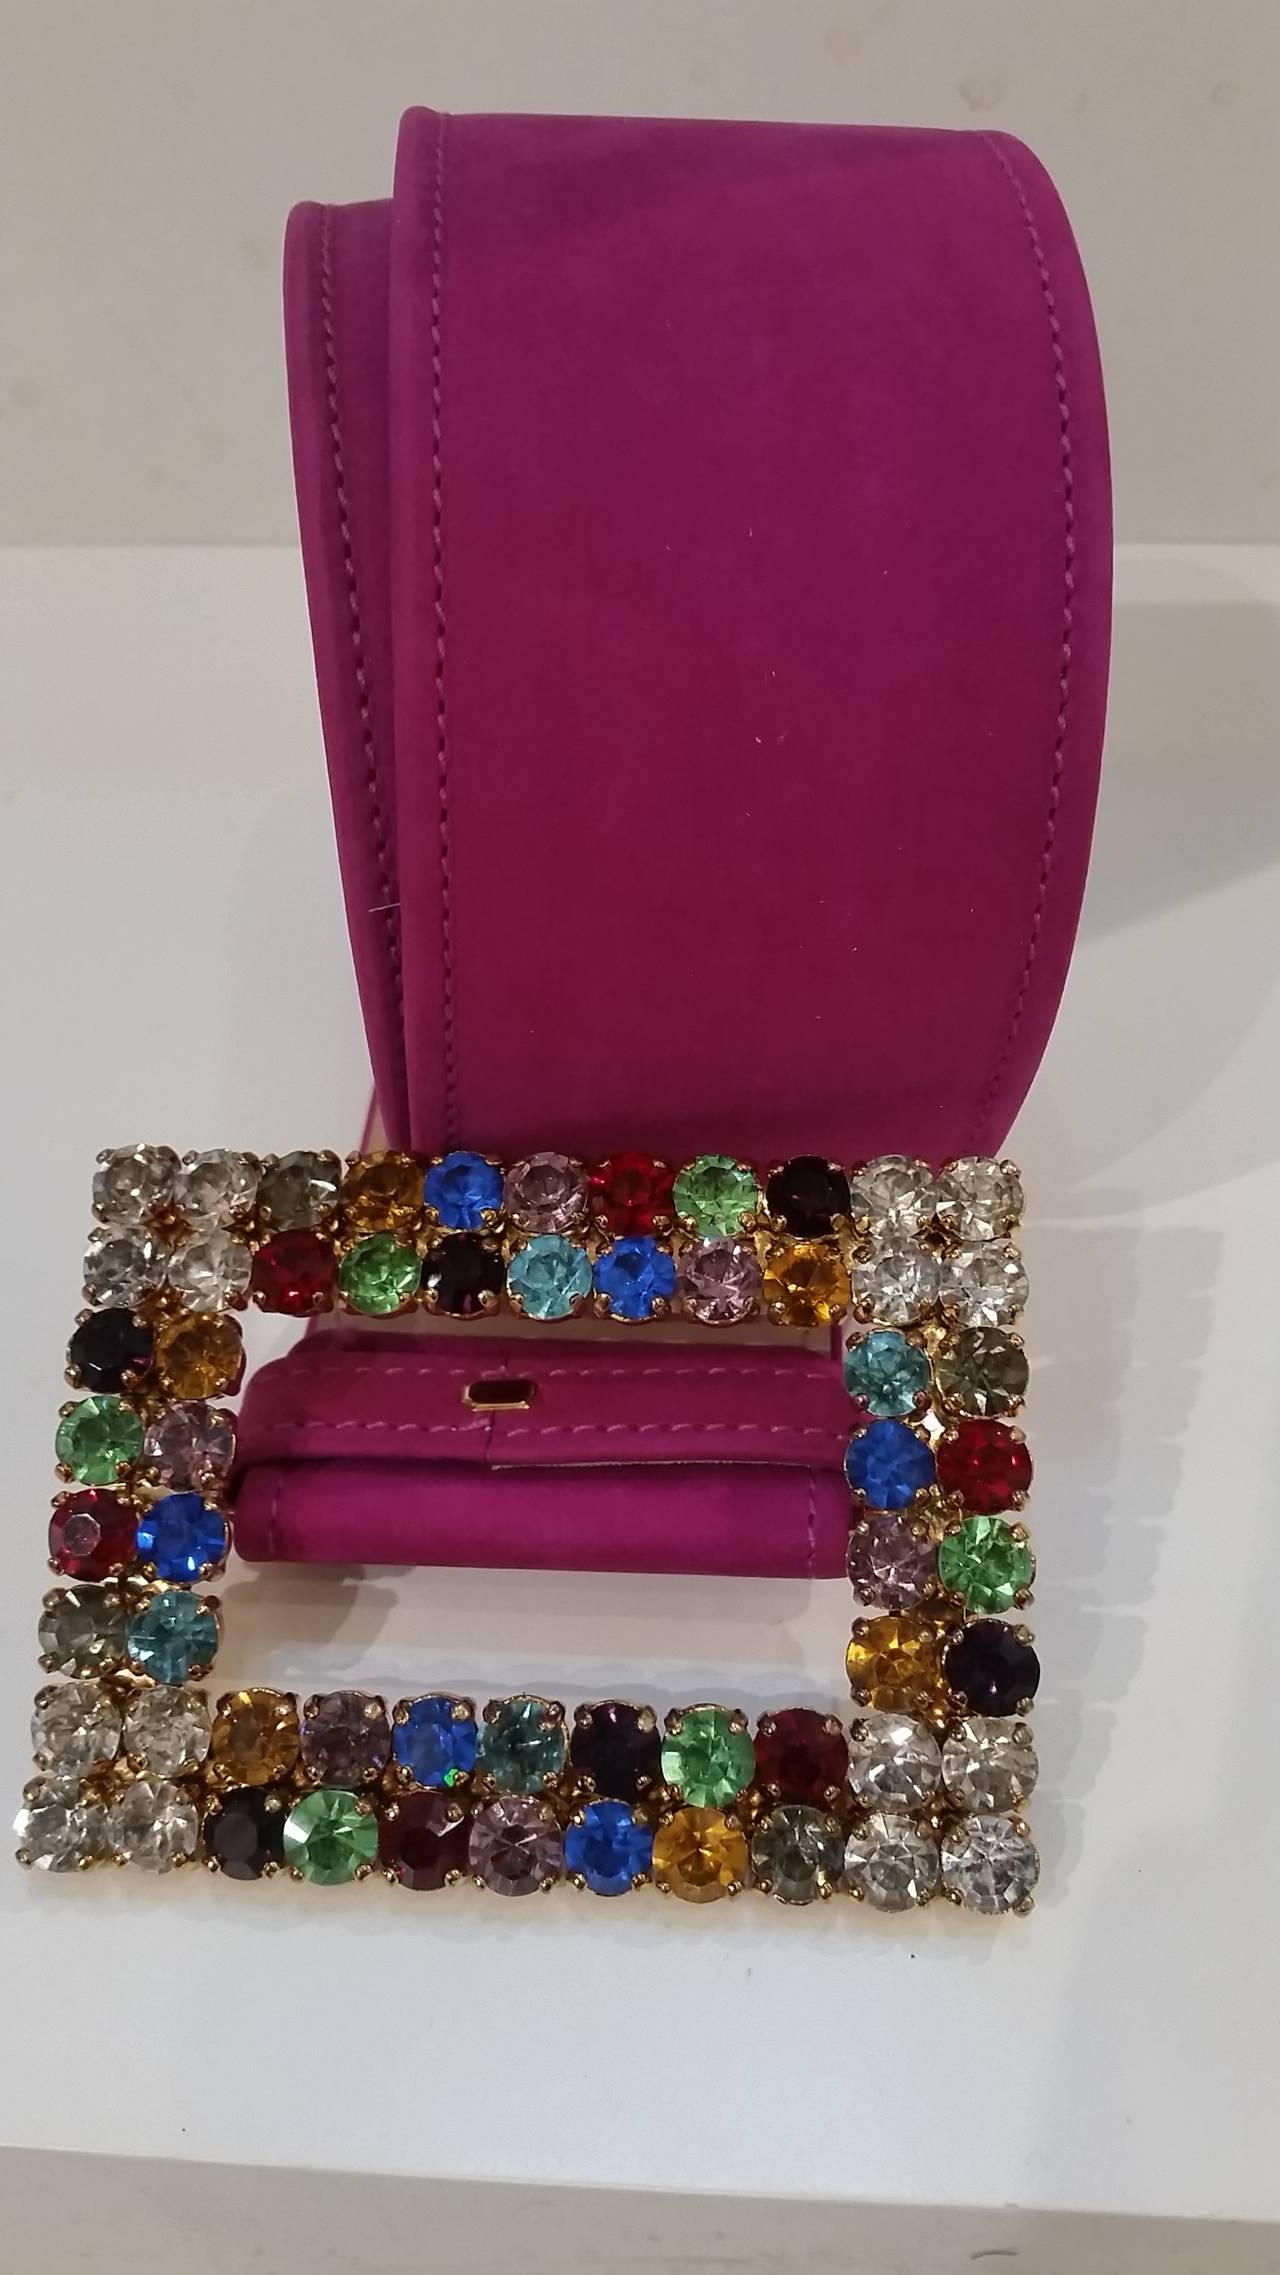 1970s Moschino Vintage fuchsia belt with Swarovski crystals 3